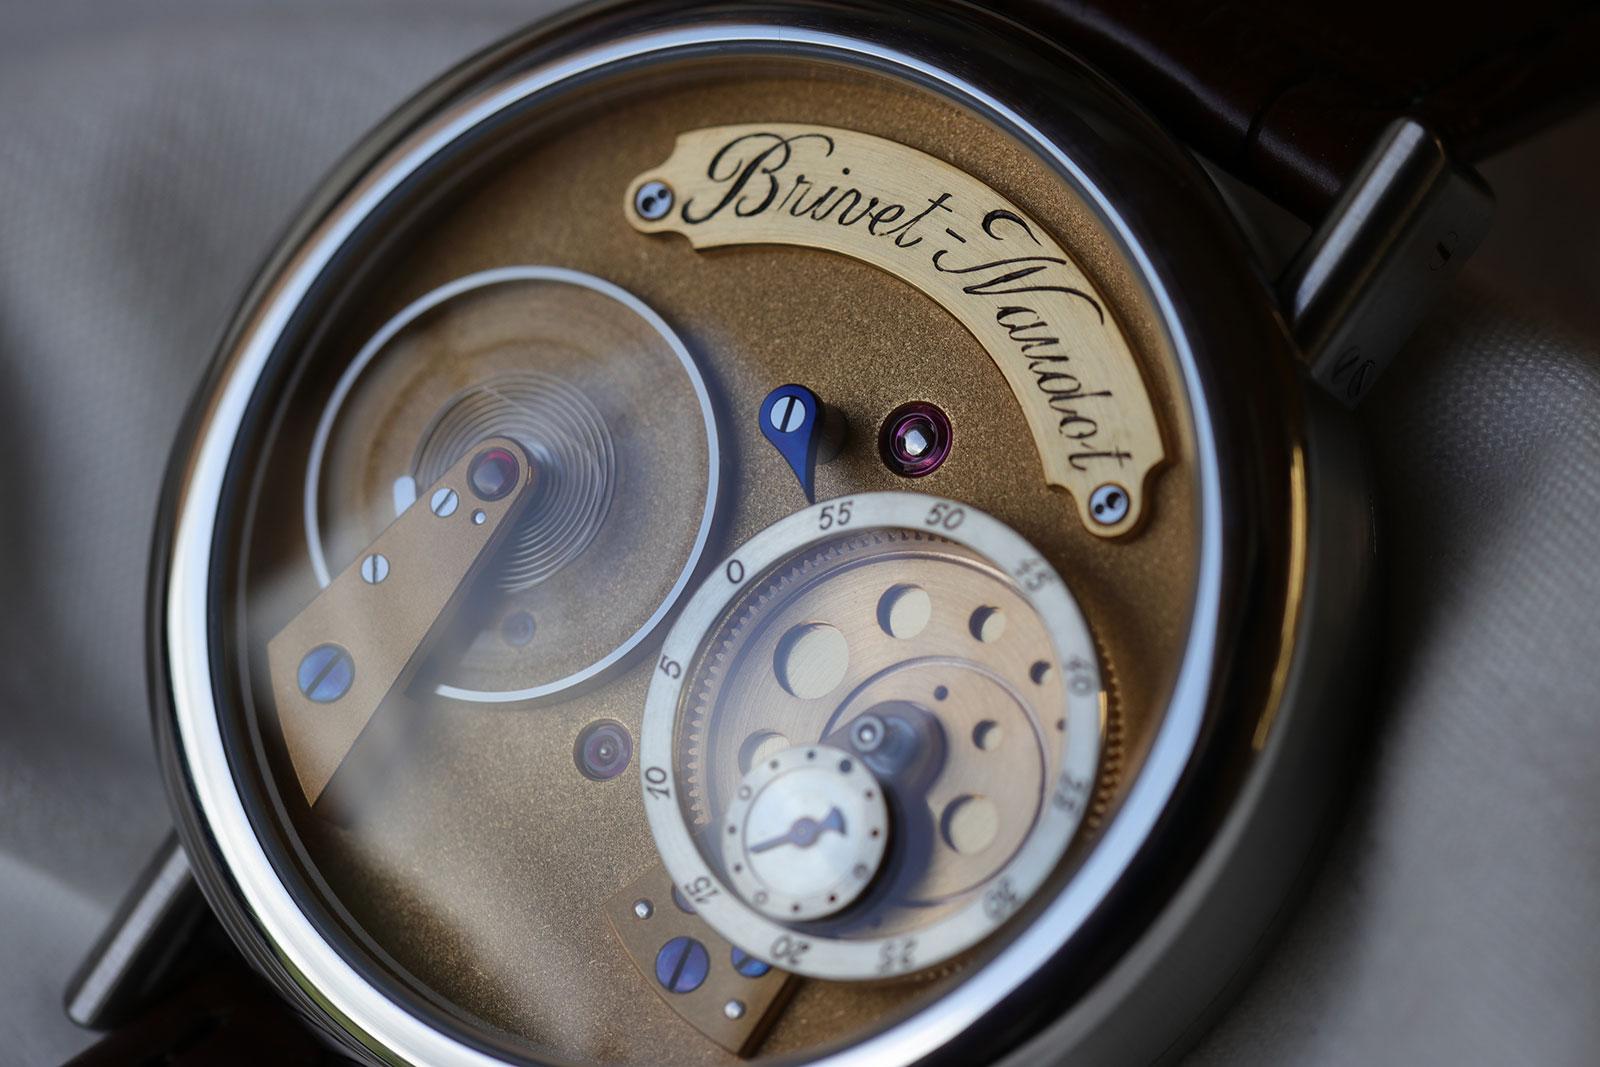 Brivet-Naudot wristwatch 5